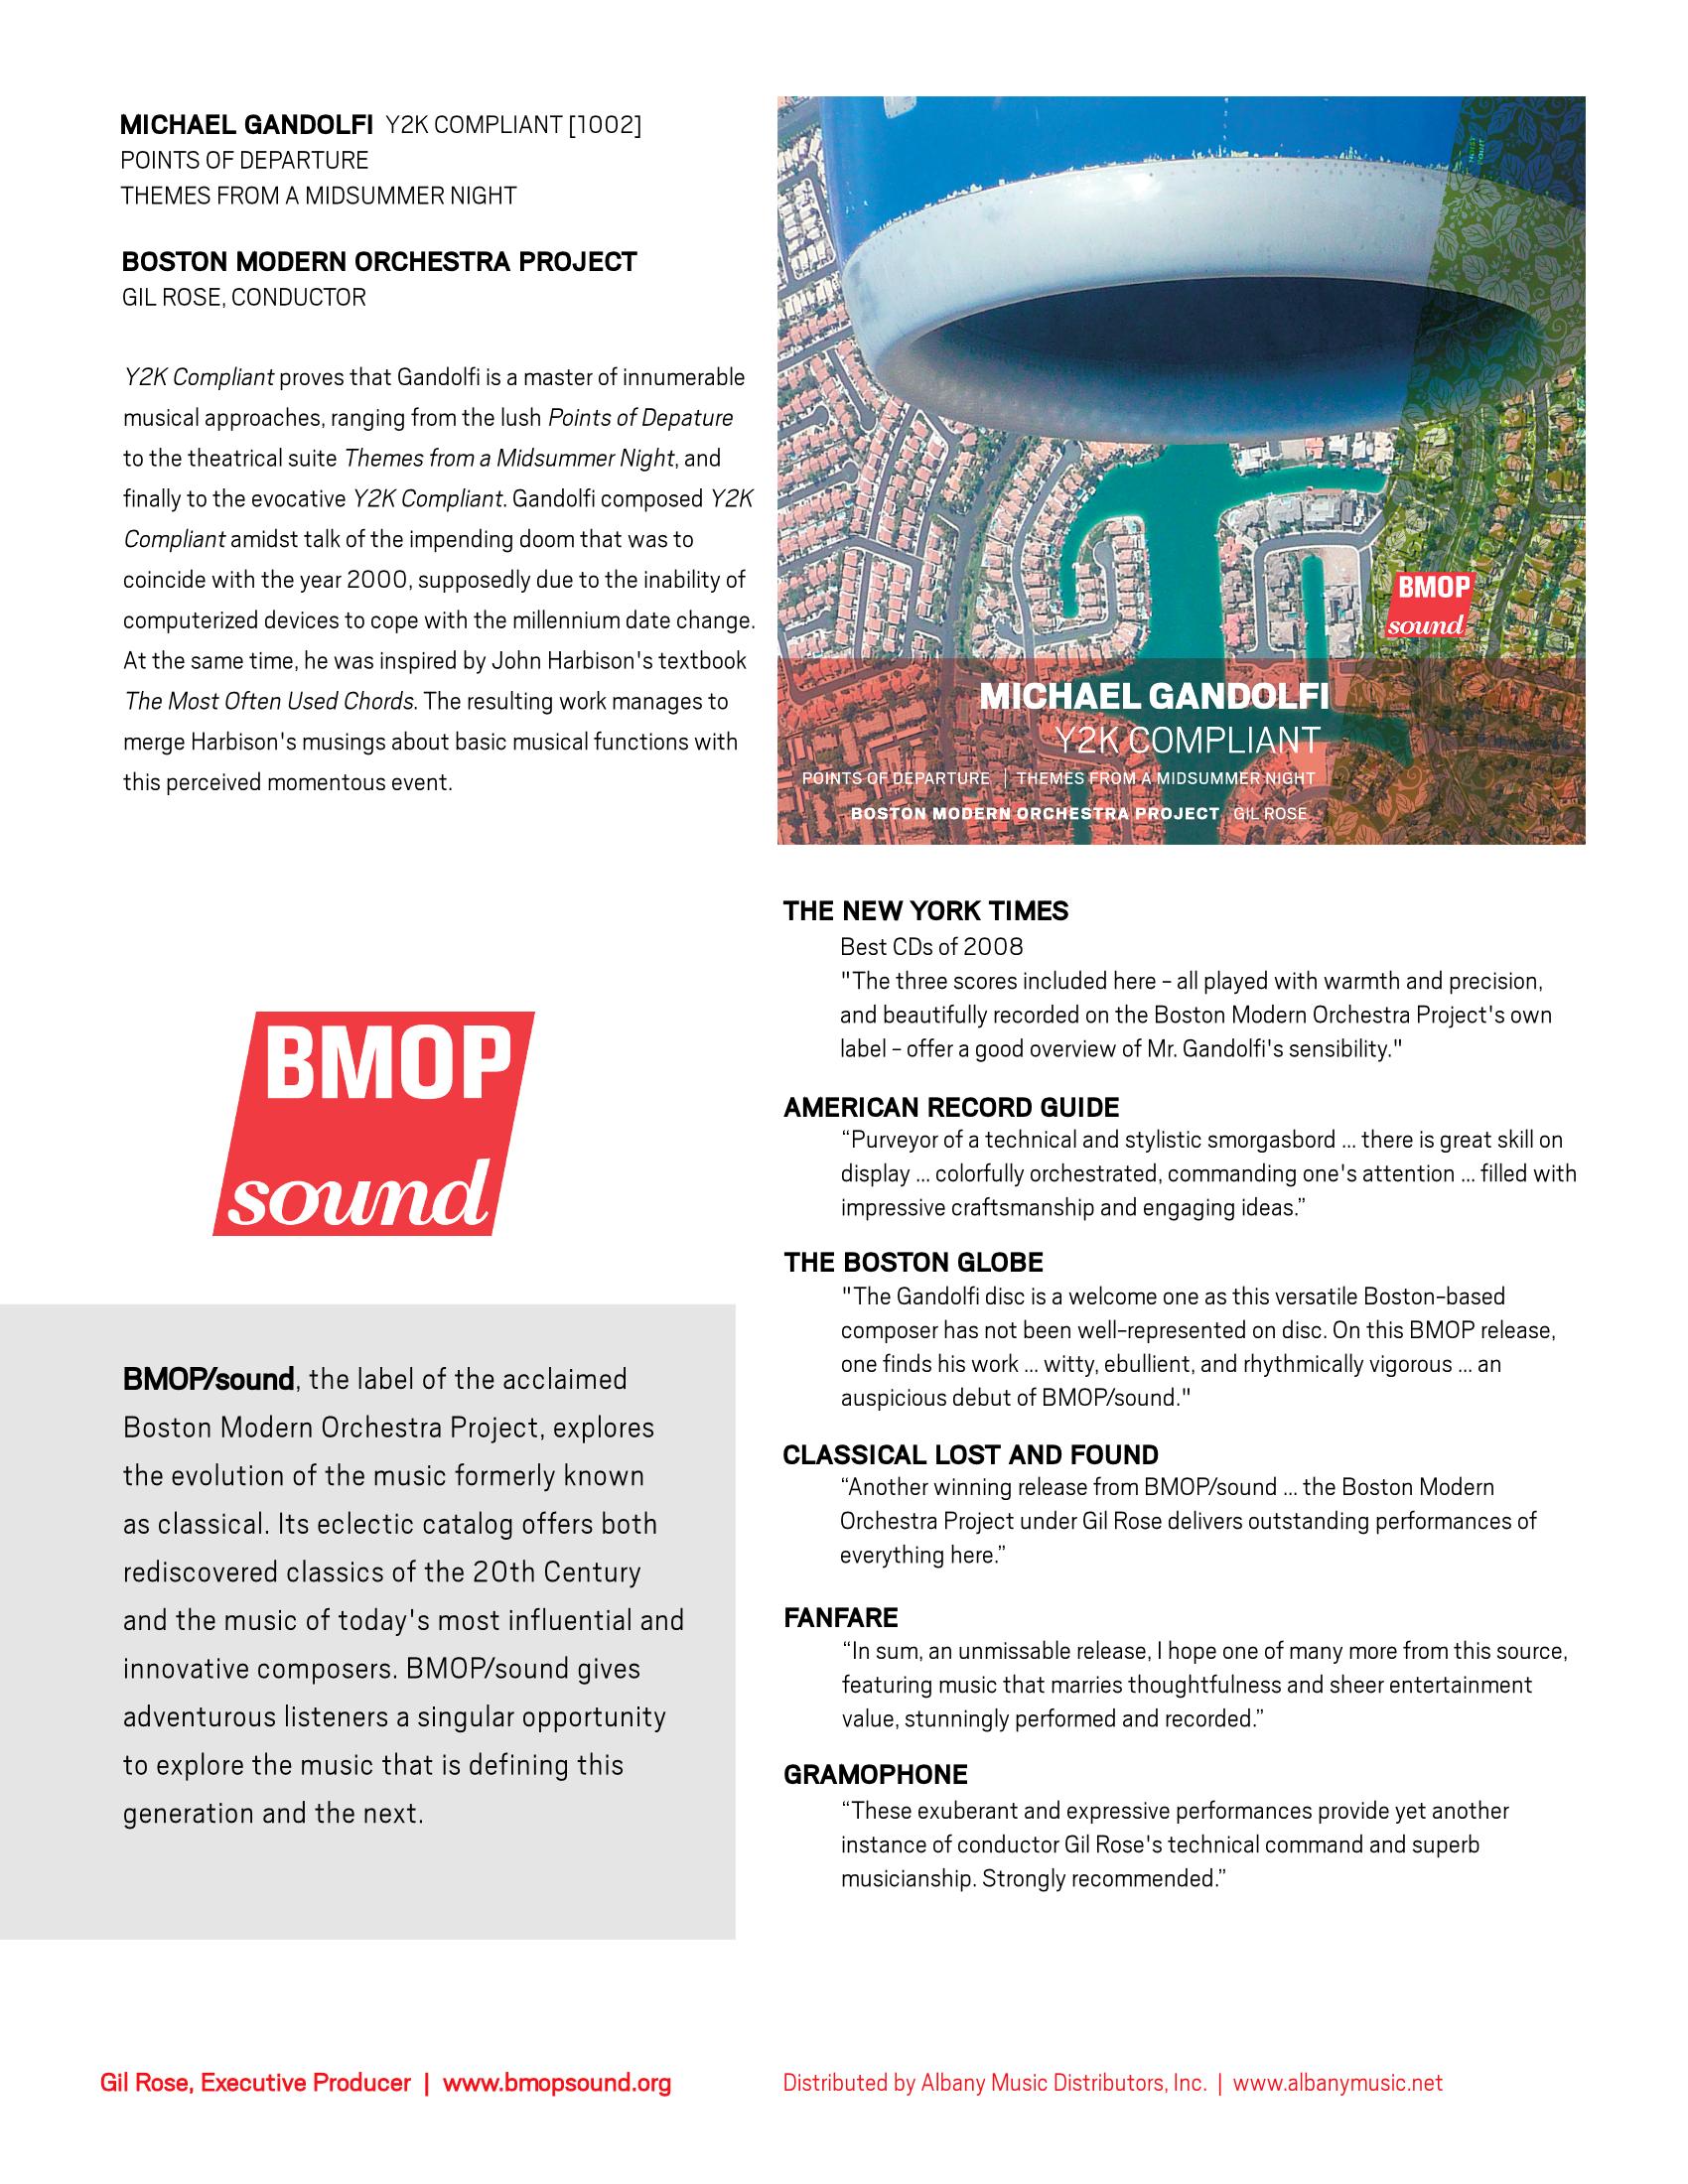 Gandolfi - BMOPsound 1002 one-sheet.png